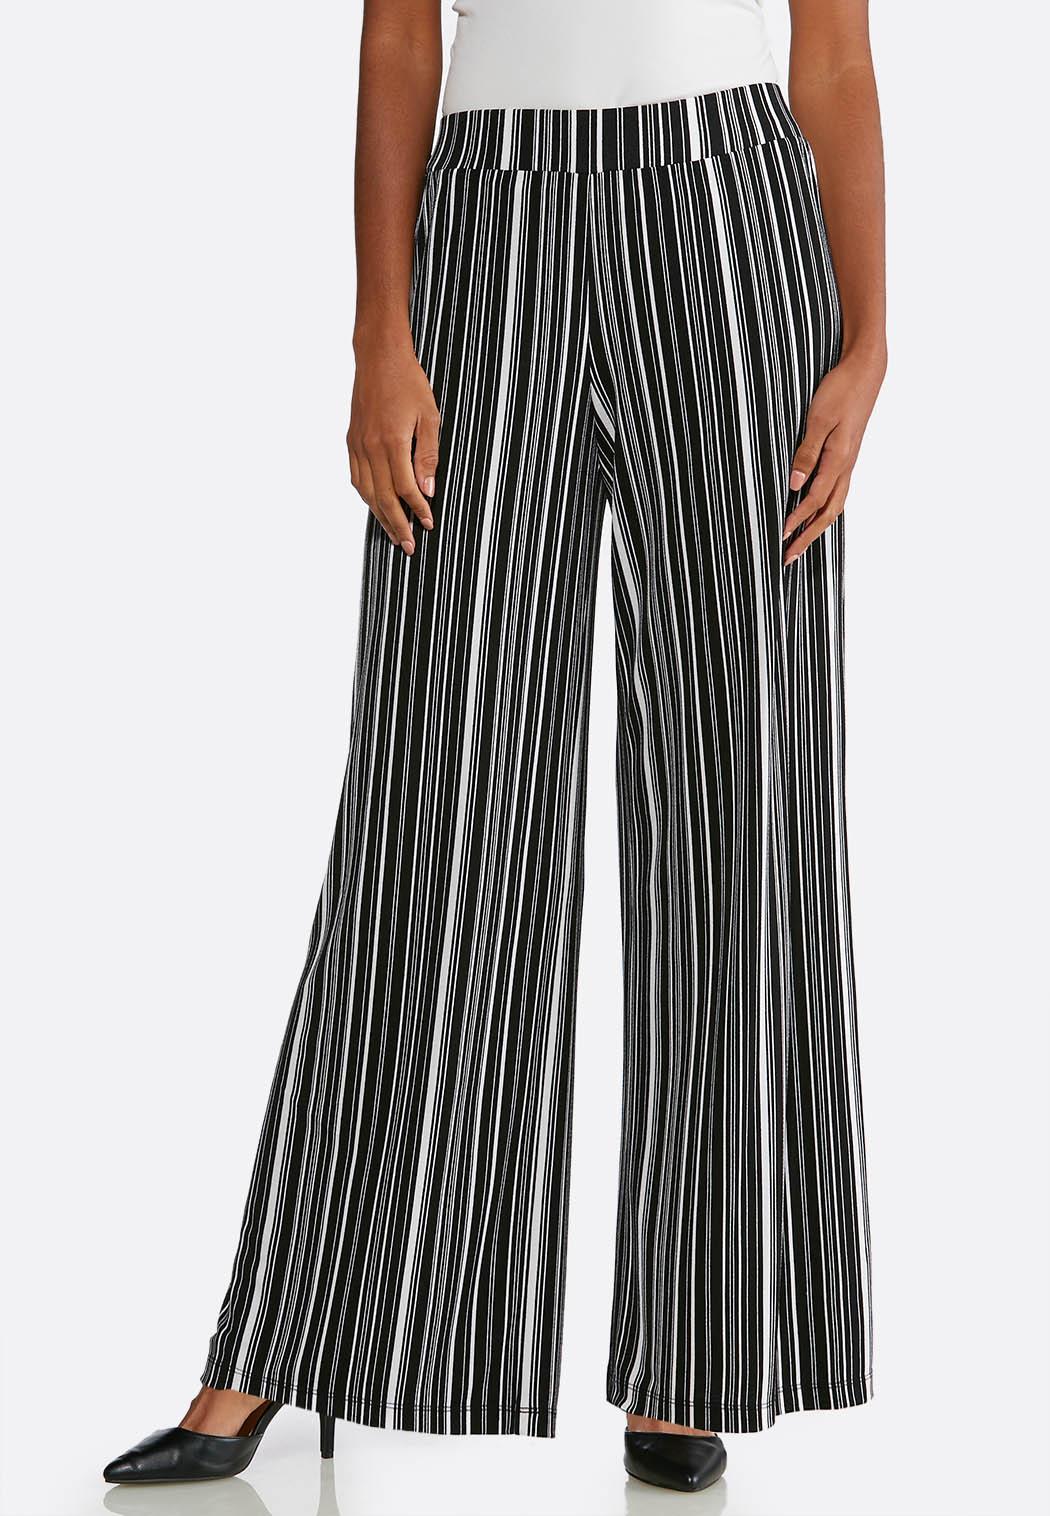 7858858140958 Stripe Crepe Palazzo Pants Wide Leg Cato Fashions